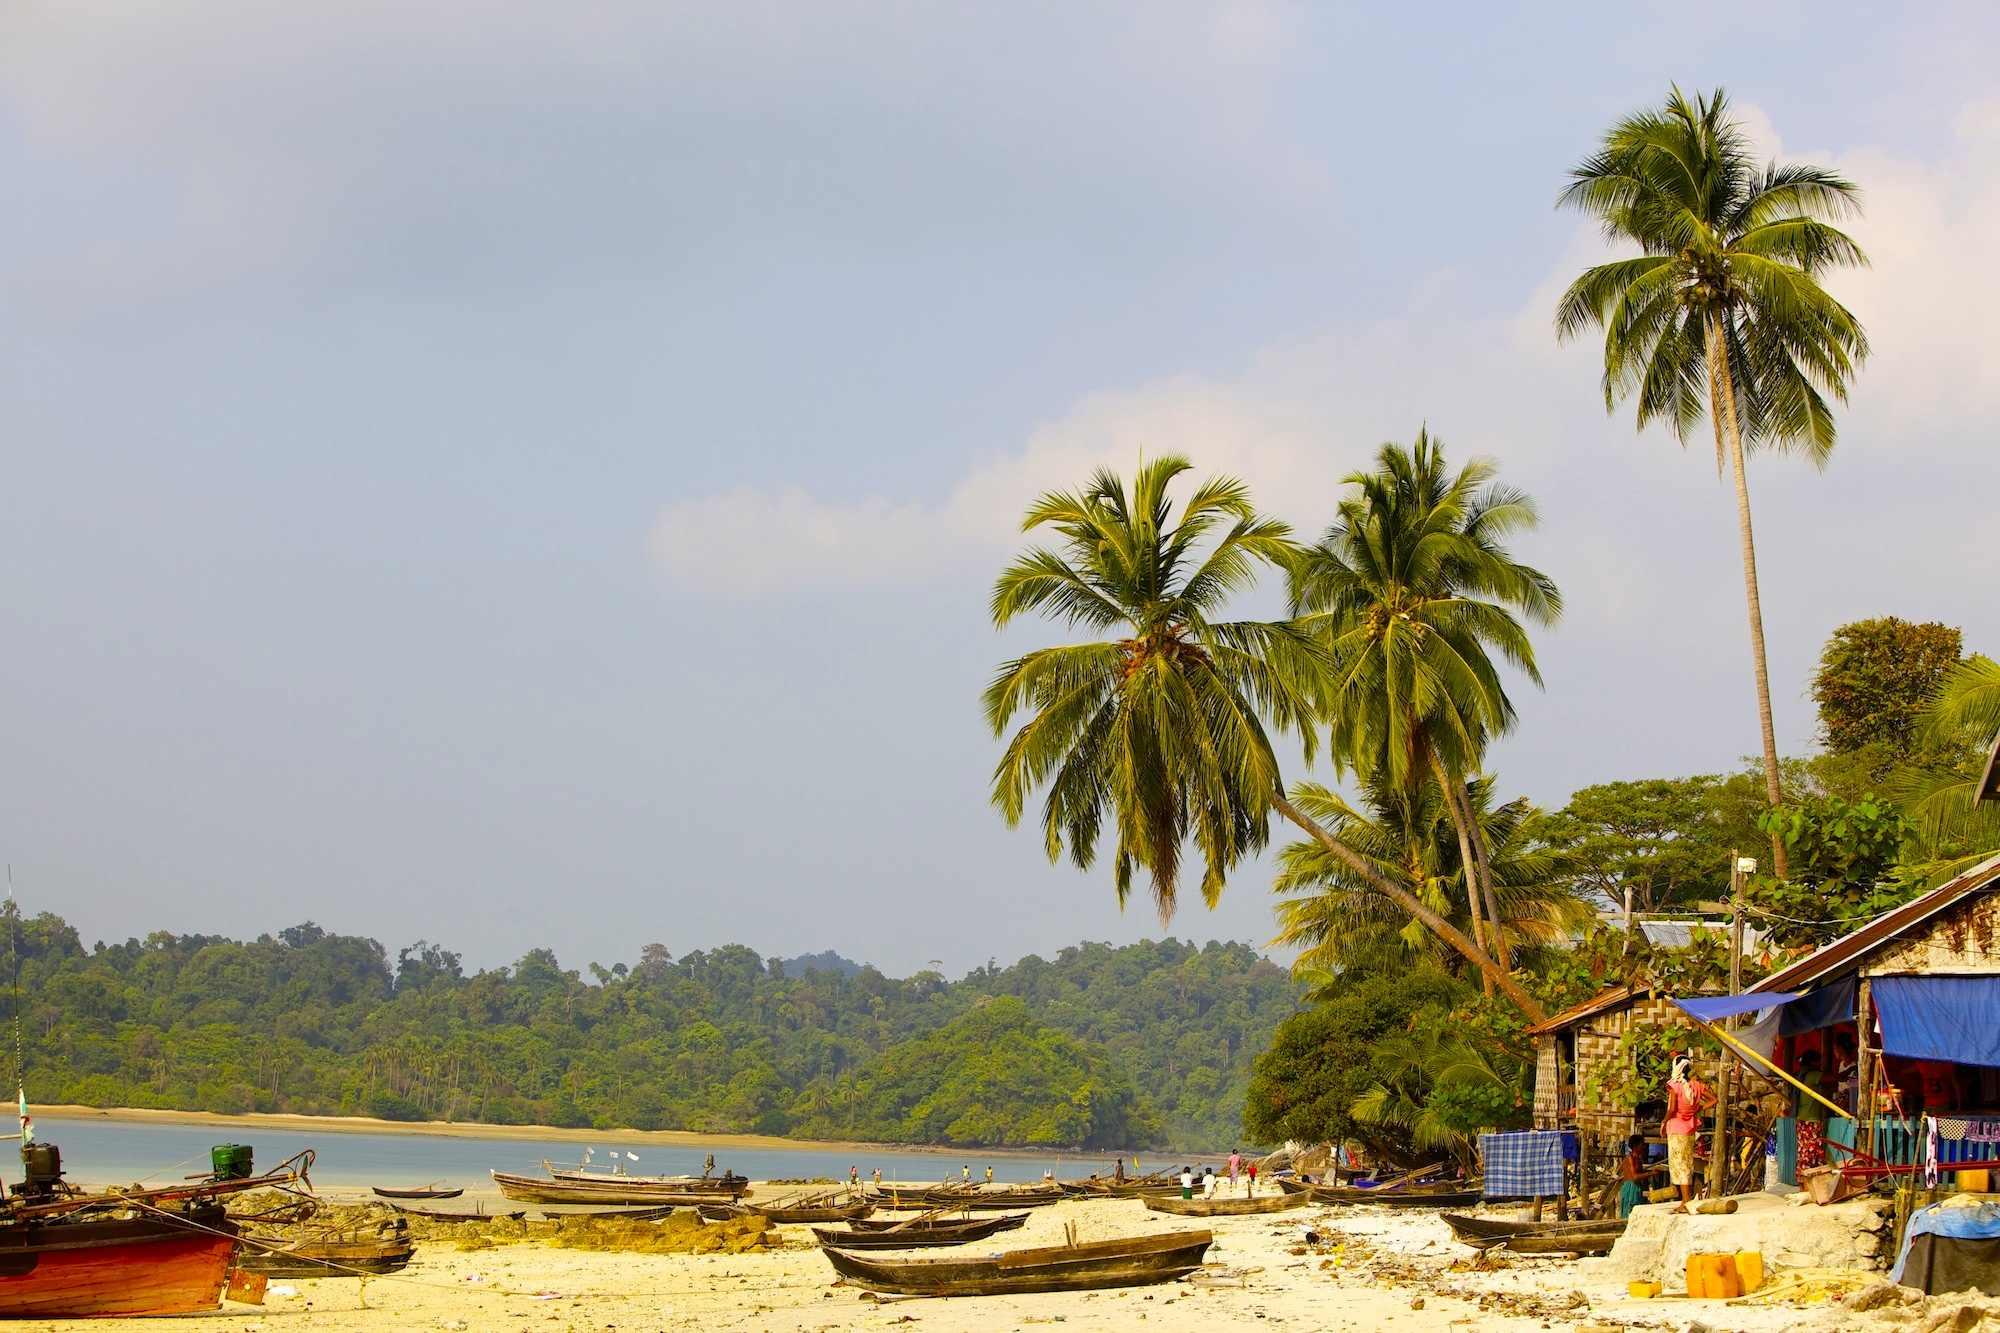 palm trees at the beach mergui.jpg